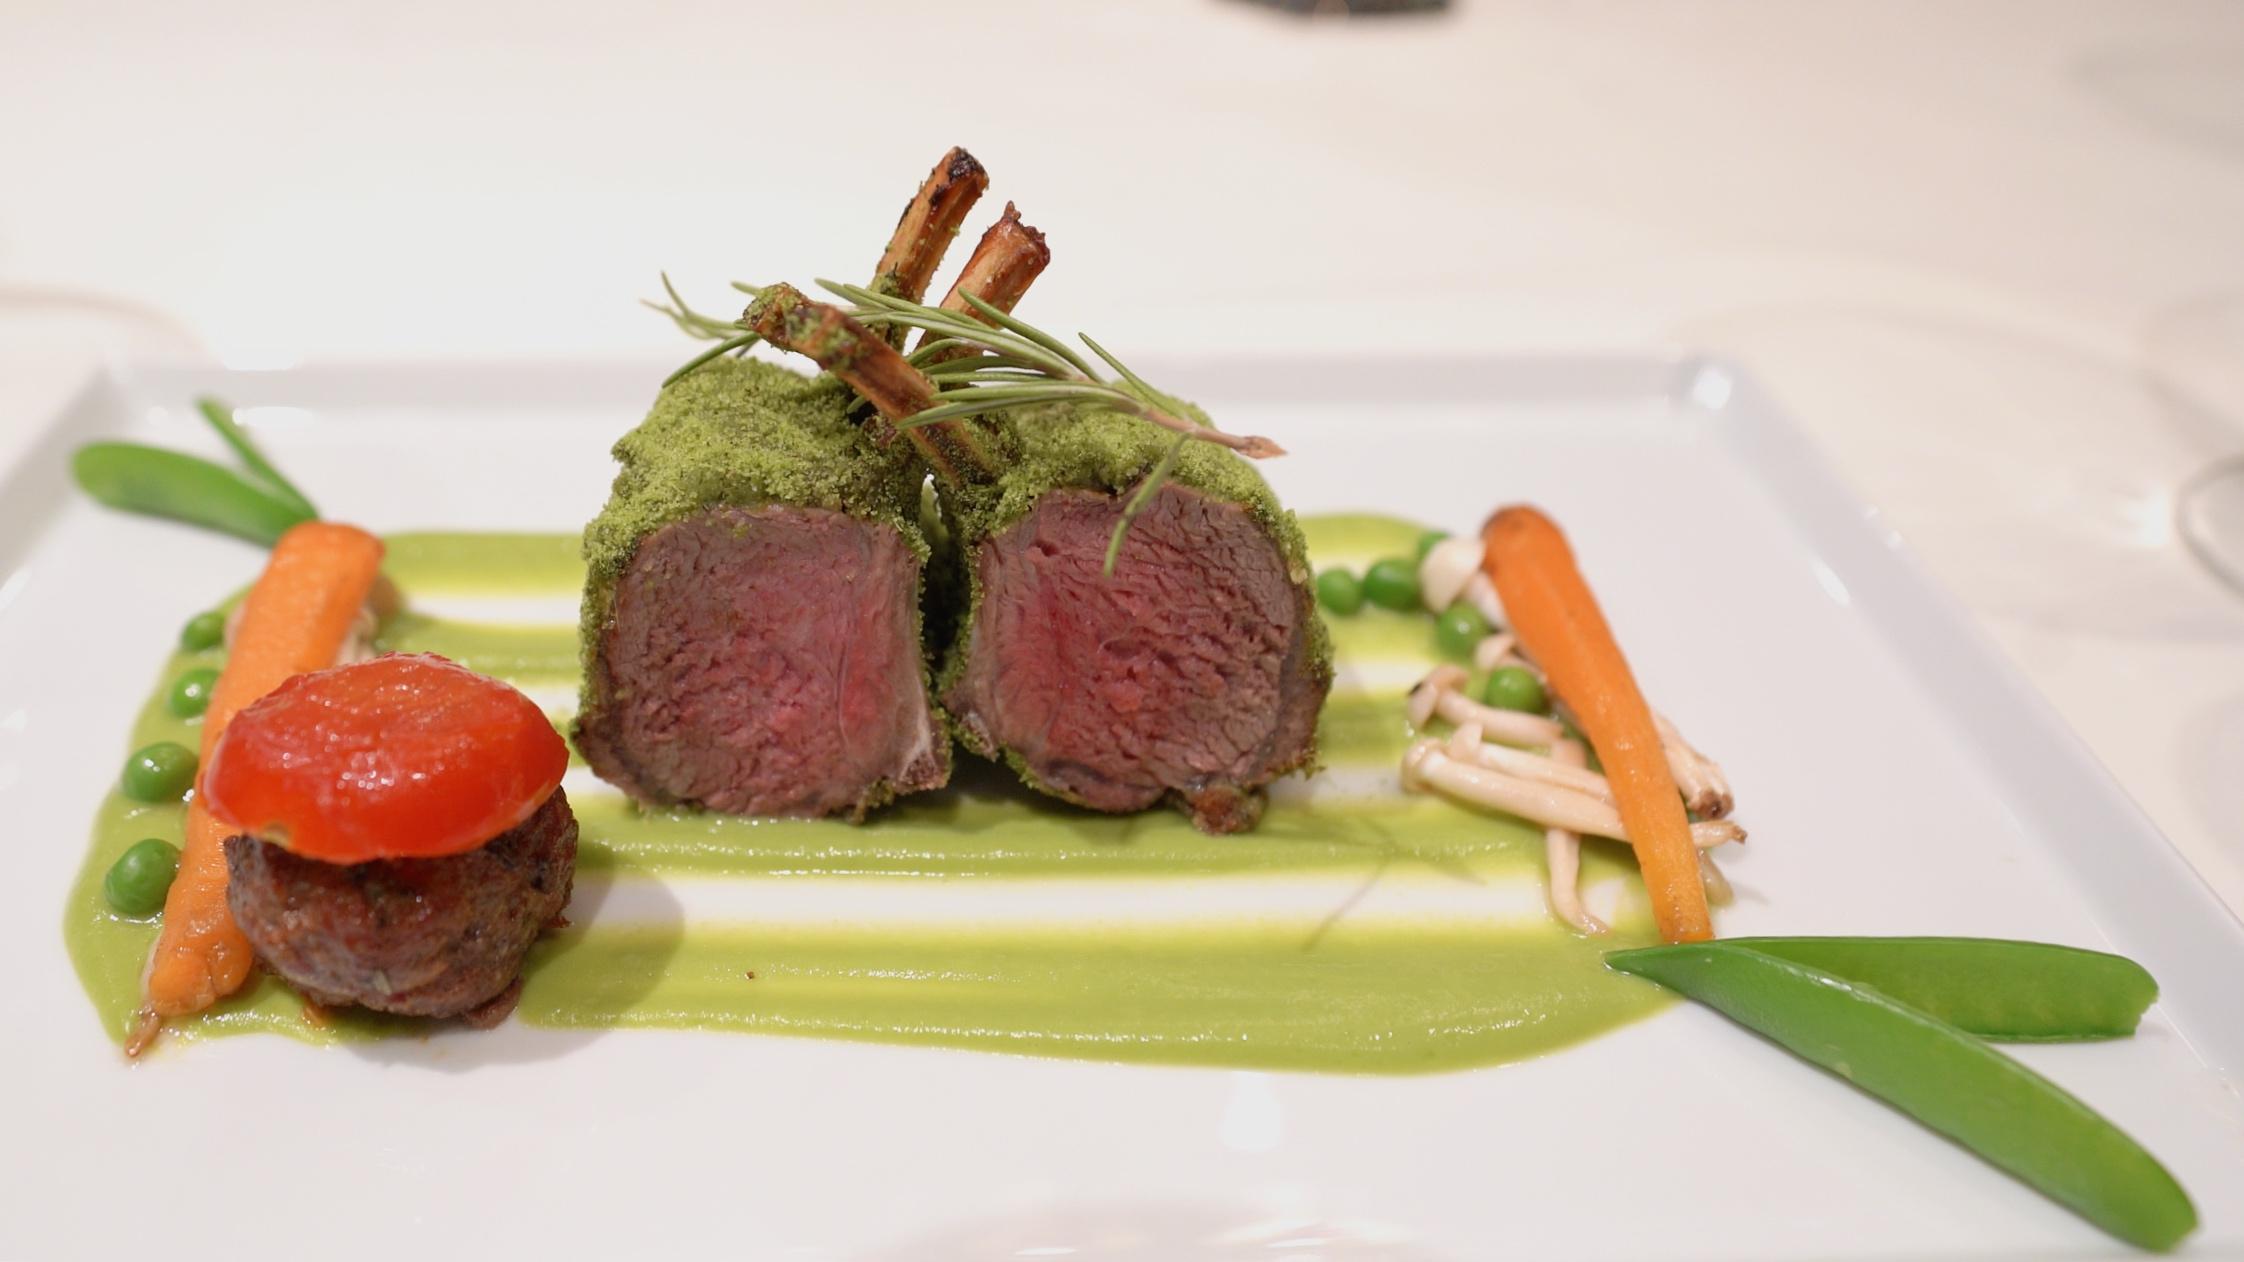 Murano lamb dish